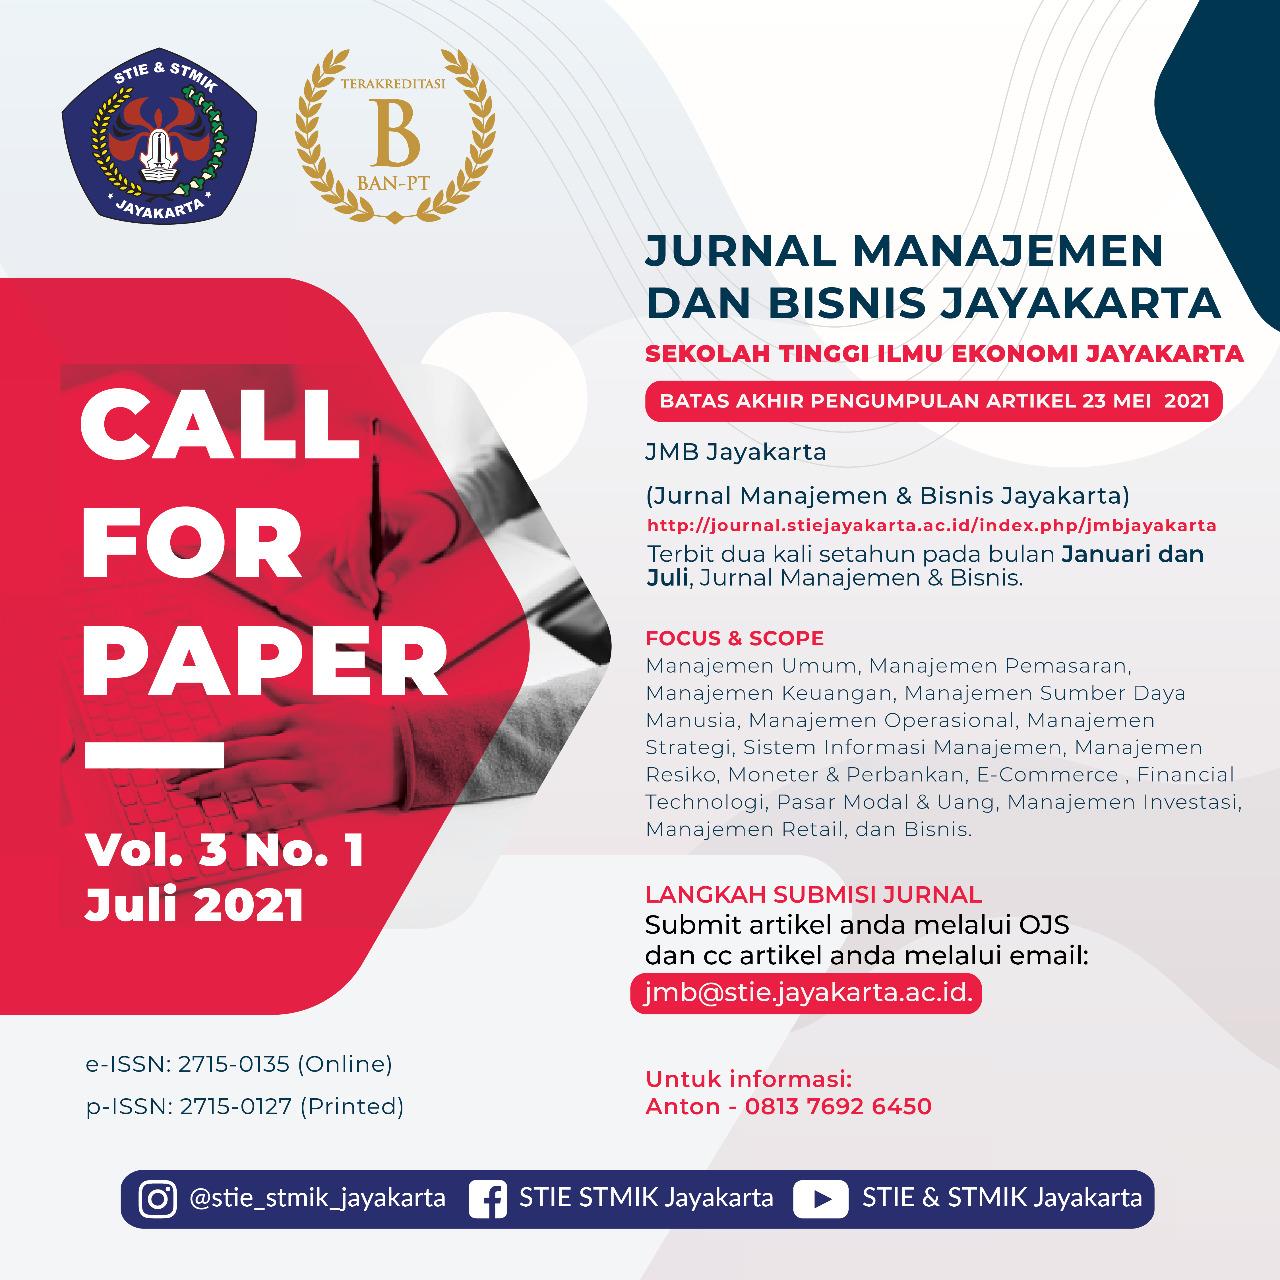 Call paper jmb jayakarta, jurnal manajemen dan bisnis jayakarta